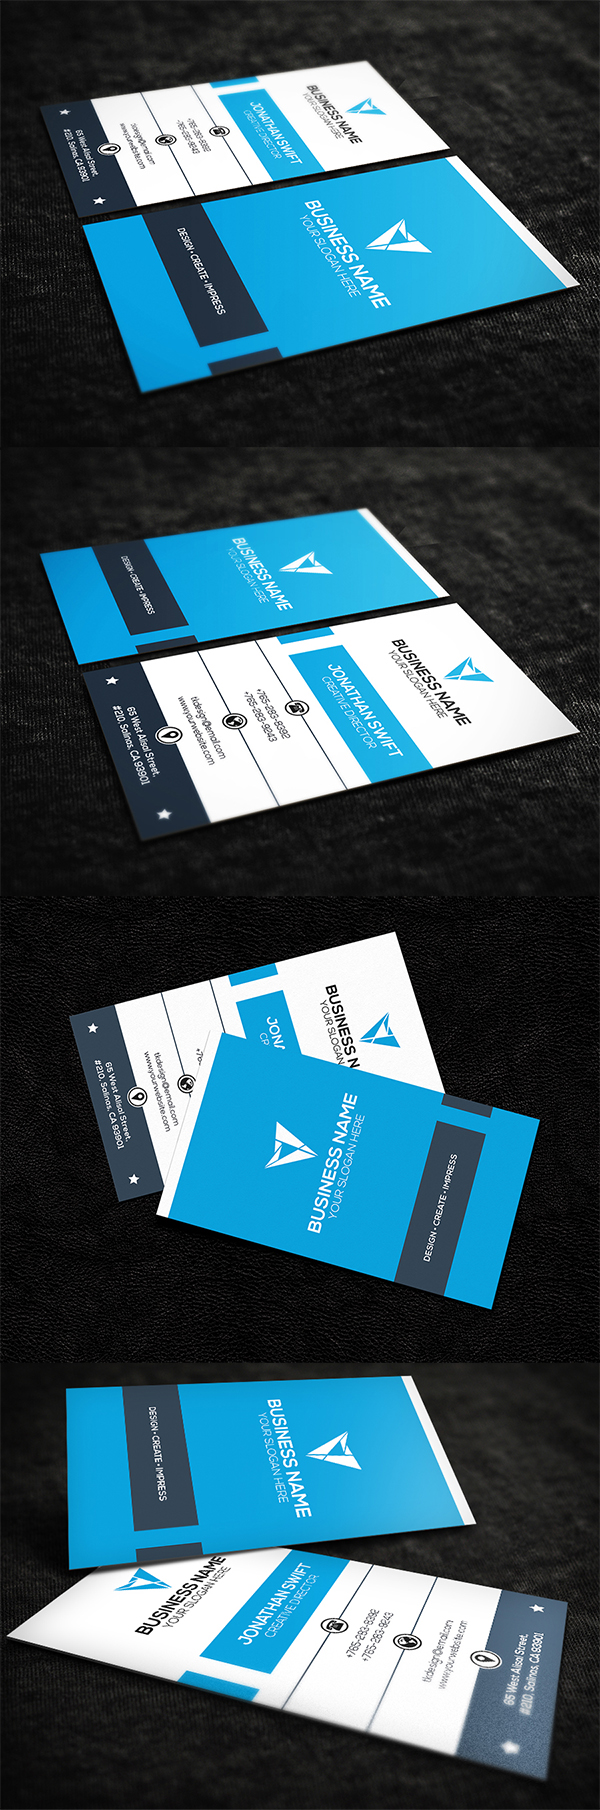 01 Business Card Design